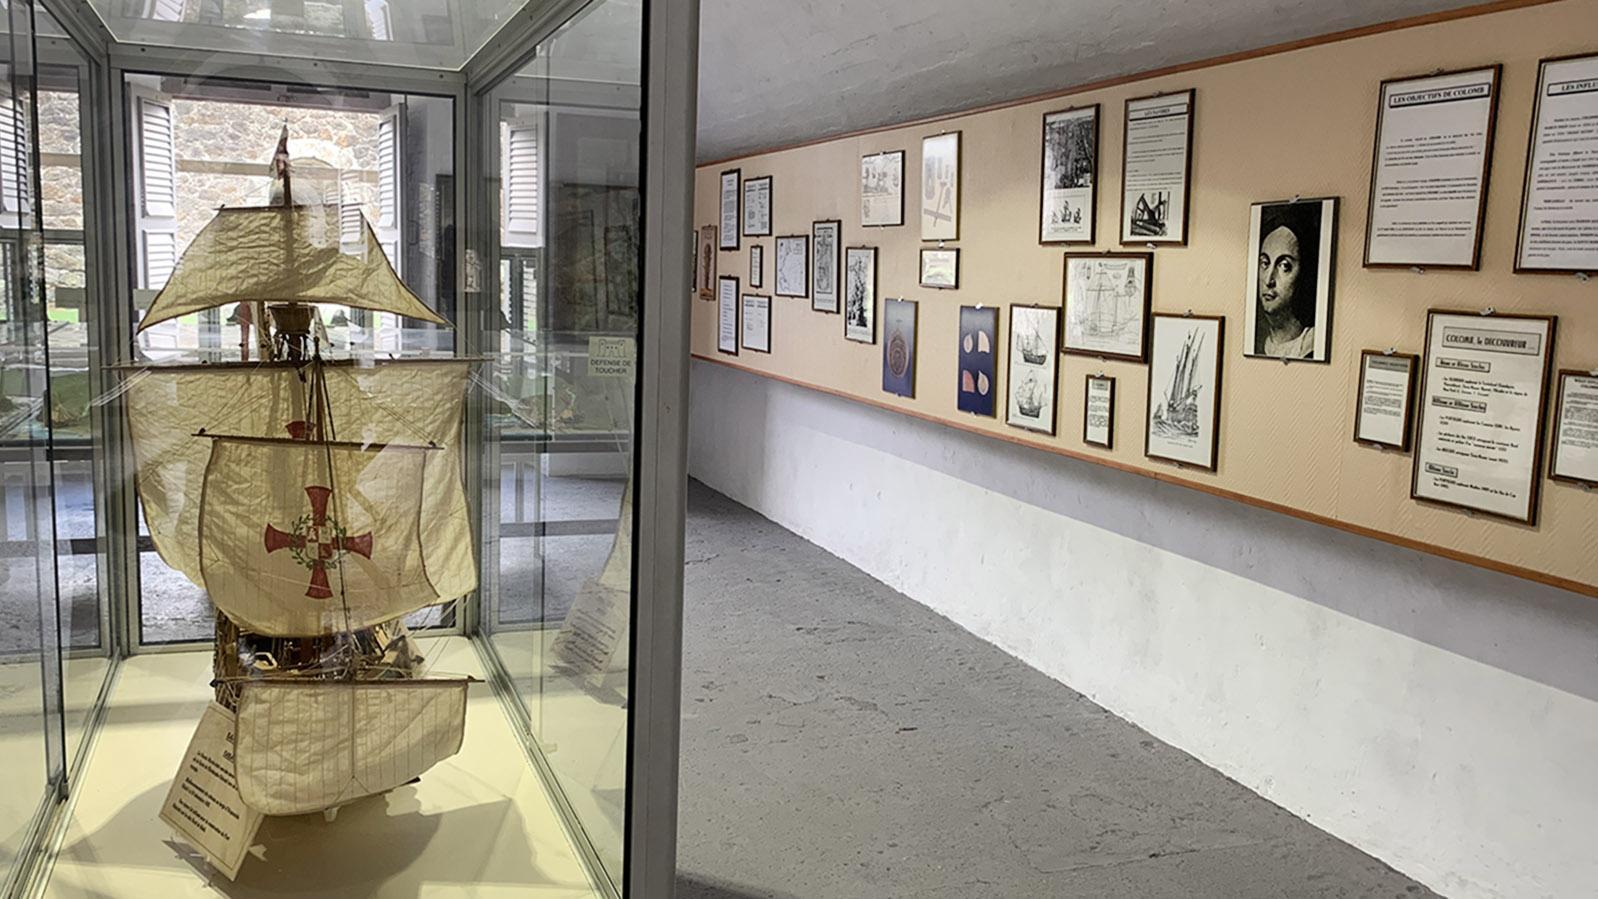 Les Saintes: Das Inselmuseum hält die Seefahrtsgeschichte der Saintes lebendig